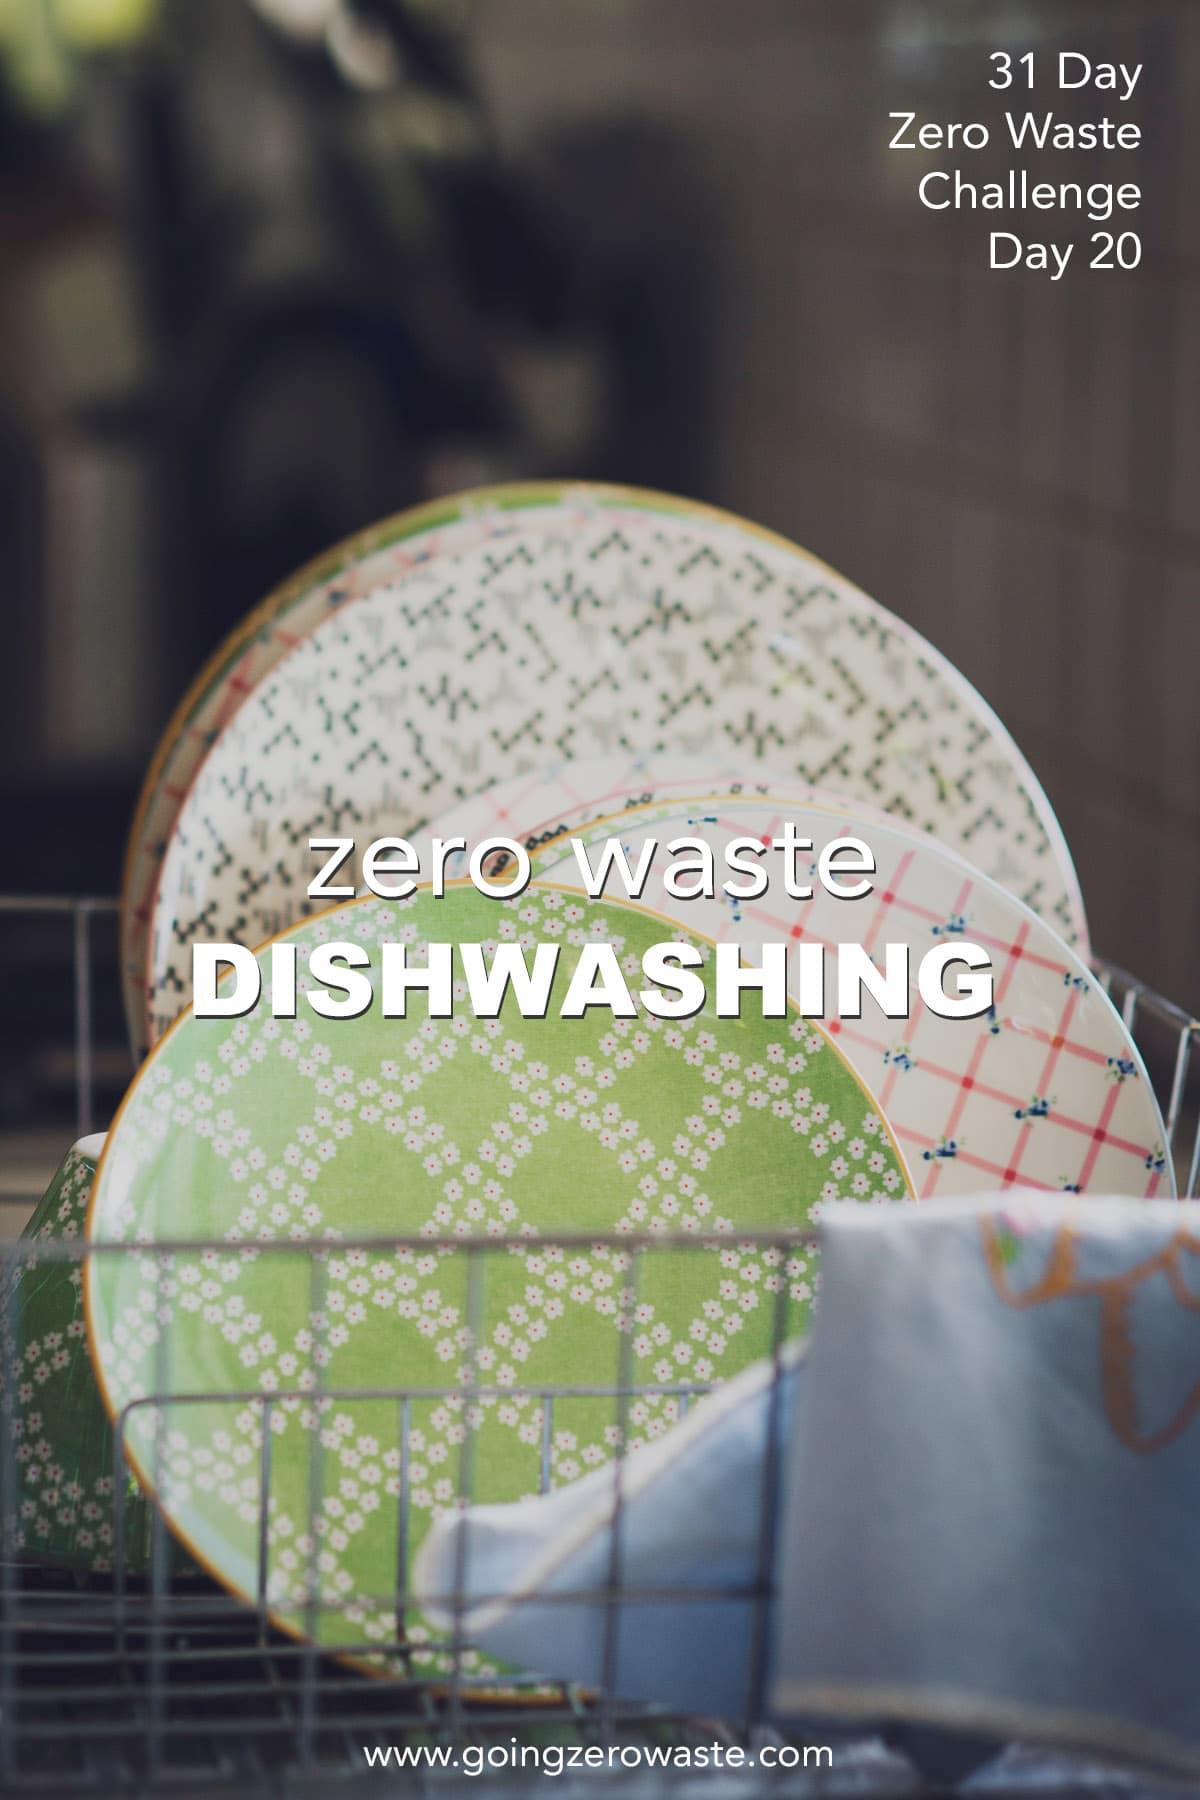 Zero Waste Dishwashing - Day 20 of the Zero Waste Challenge from www.goingzerowaste.com #zerowaste #ecofriendly #gogreen #sustainable #zerowastechallenge #challenge #sustainablelivingchallenge #dishwashing #dishes